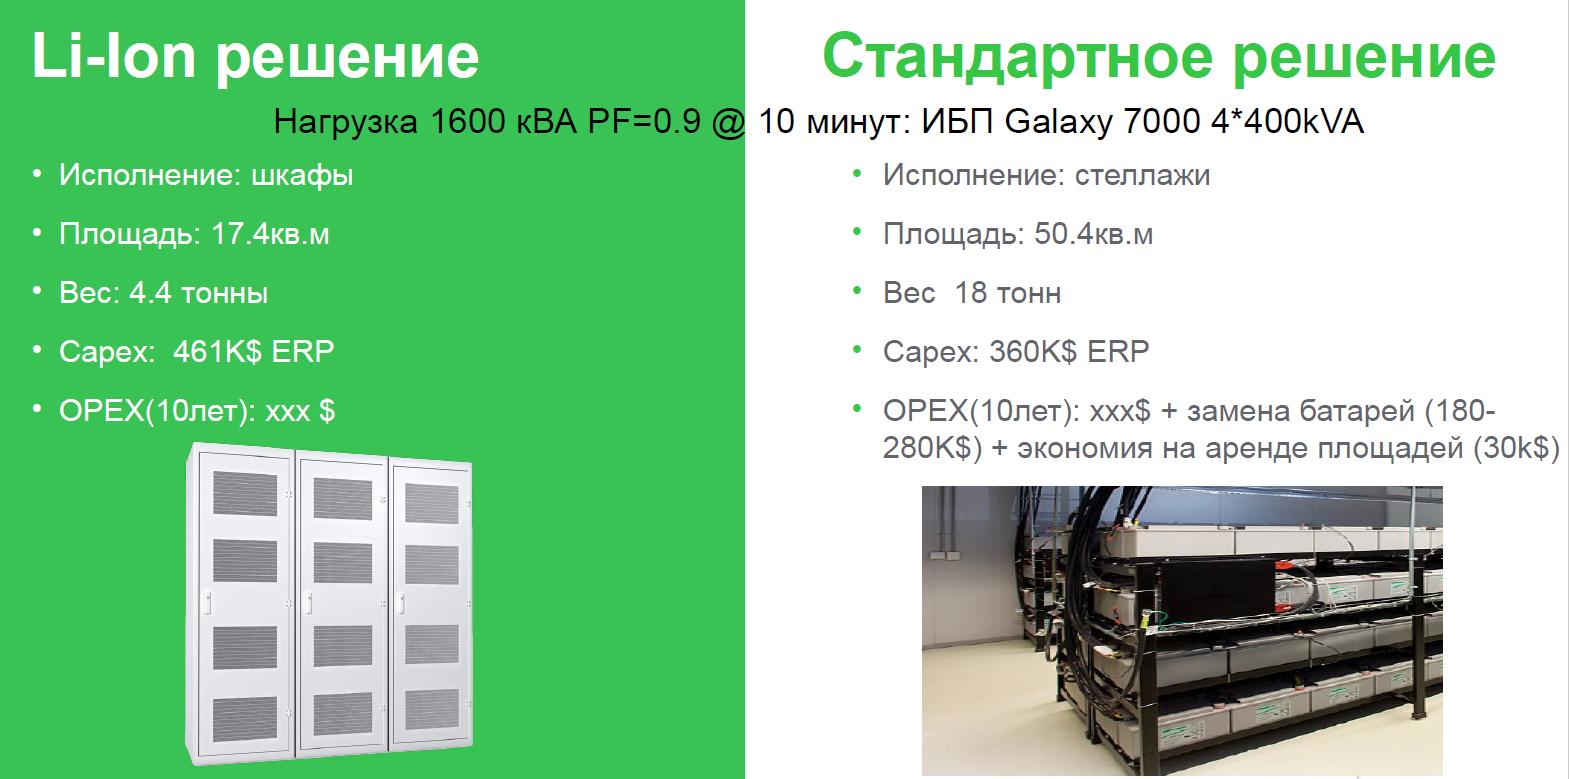 Смена аккумуляторов: ИБП на технологии Li-Ion - 5